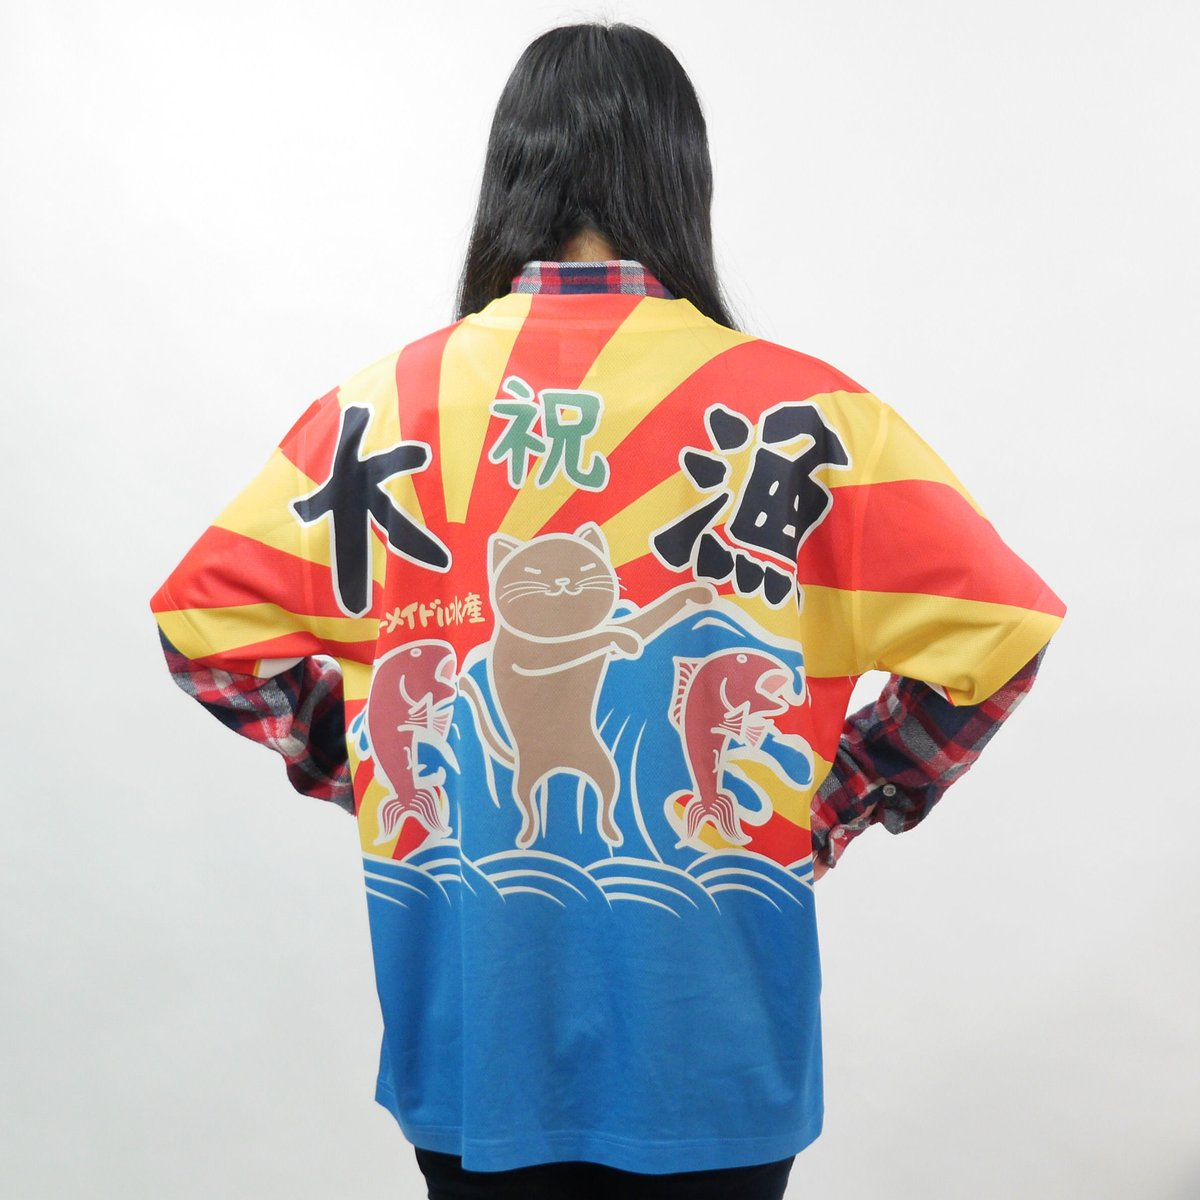 Amber(アンバー) 大漁旗Tシャツ 半袖 ドライ生地 【送料無料】